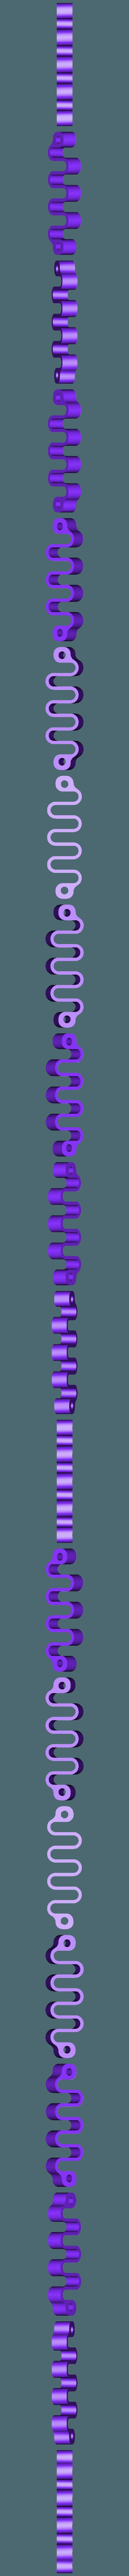 TruckV3_Spring_PLA_Soft.STL Download STL file 3D Printed RC Truck V3 • 3D print model, MrCrankyface